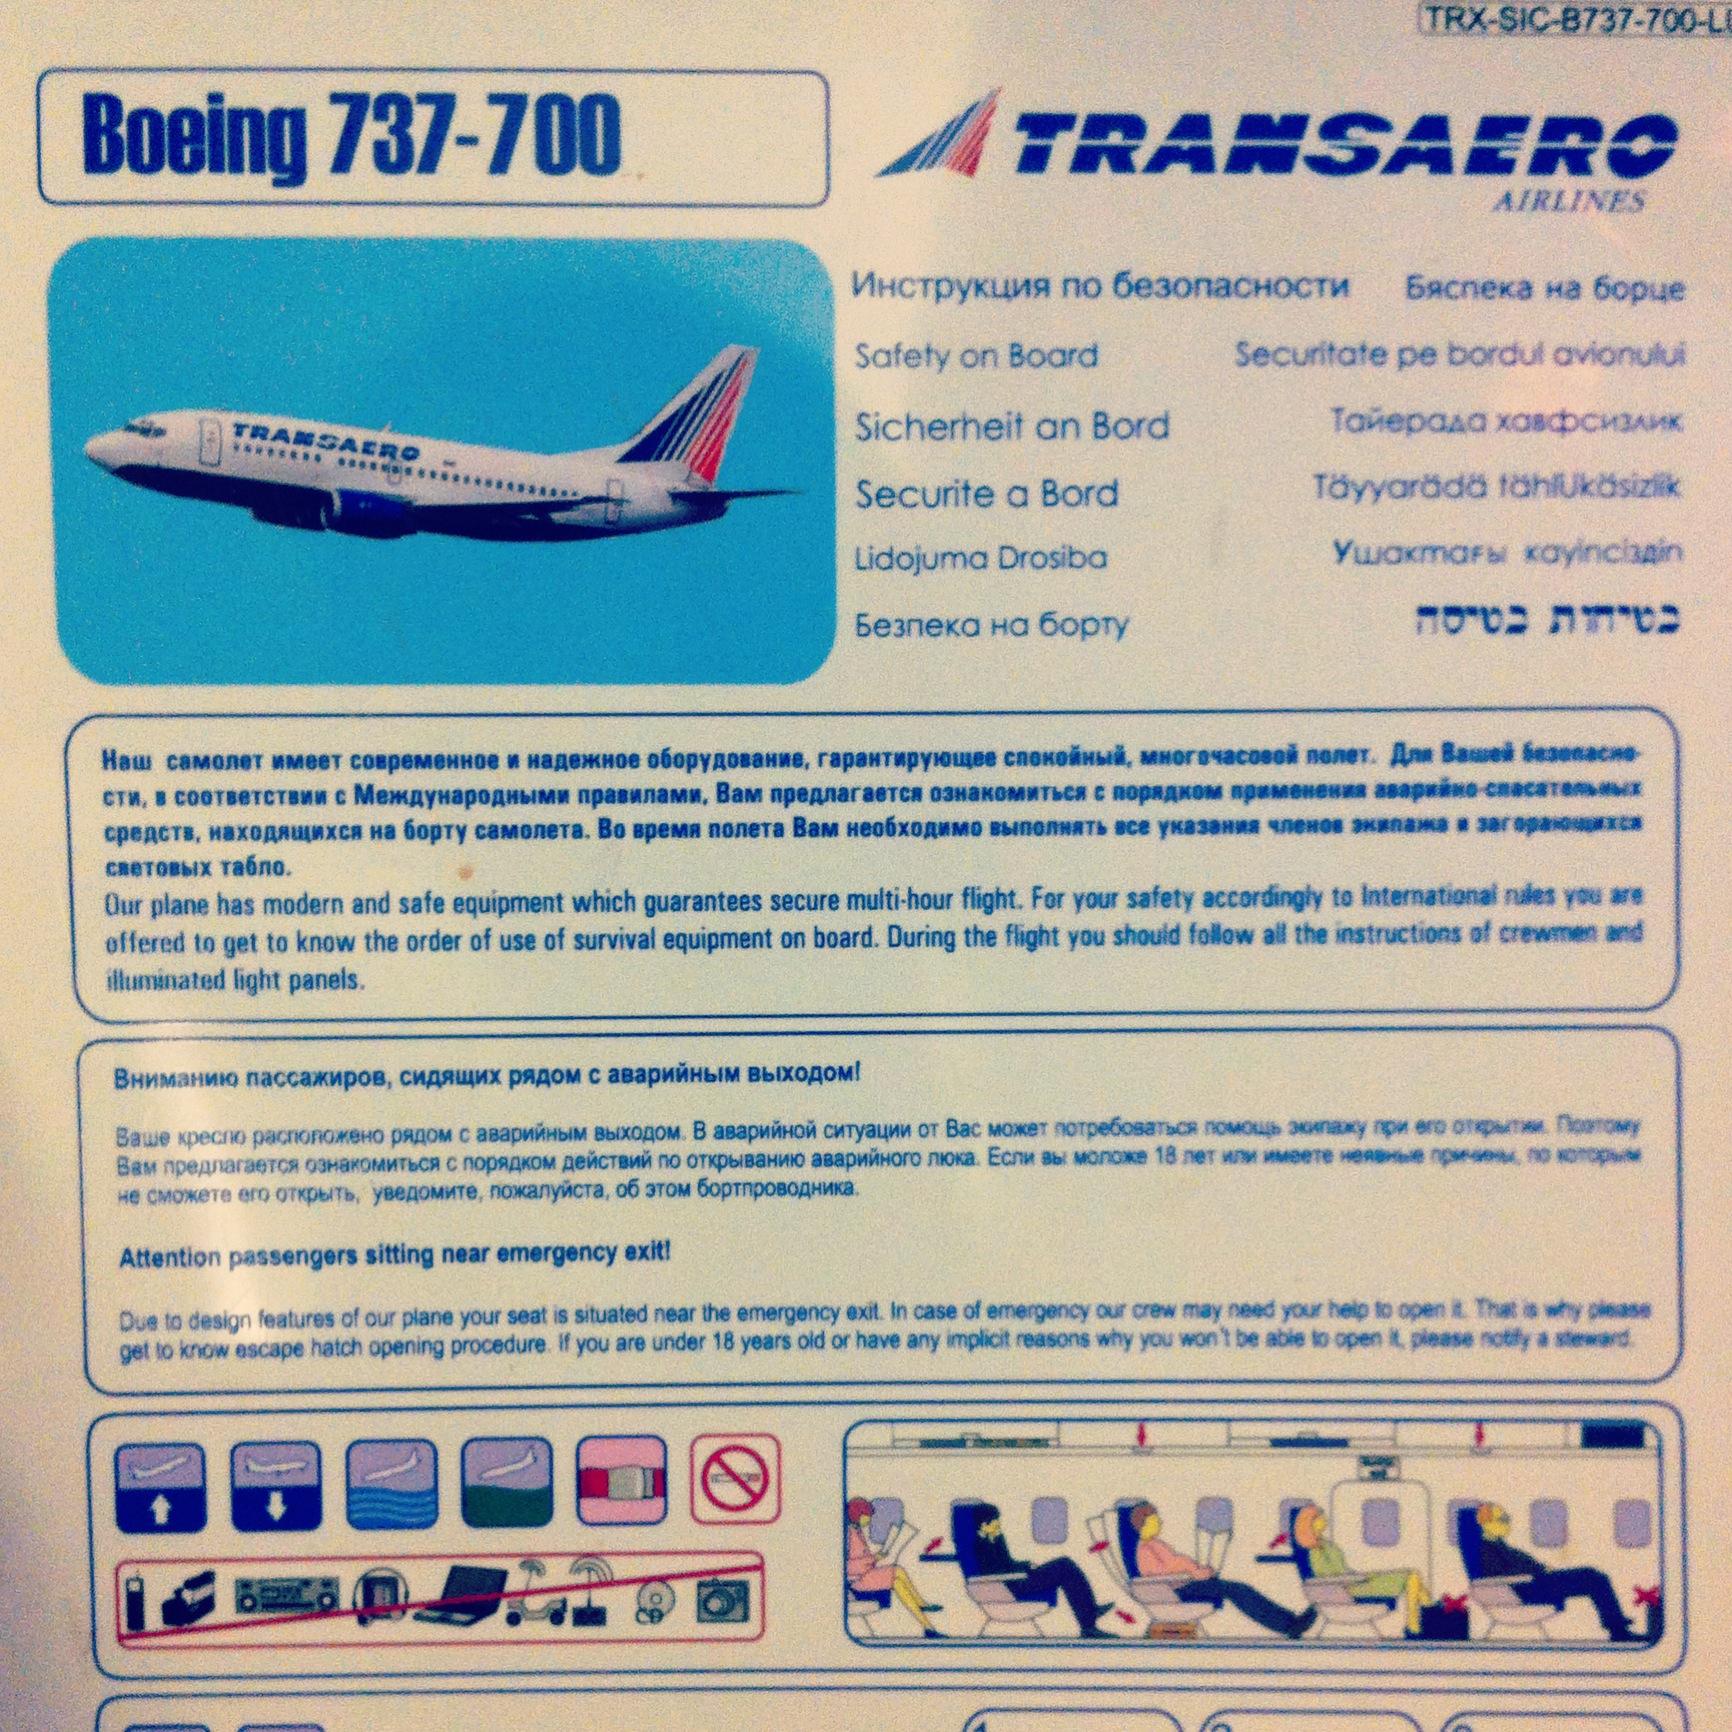 Transaero safety card.JPG